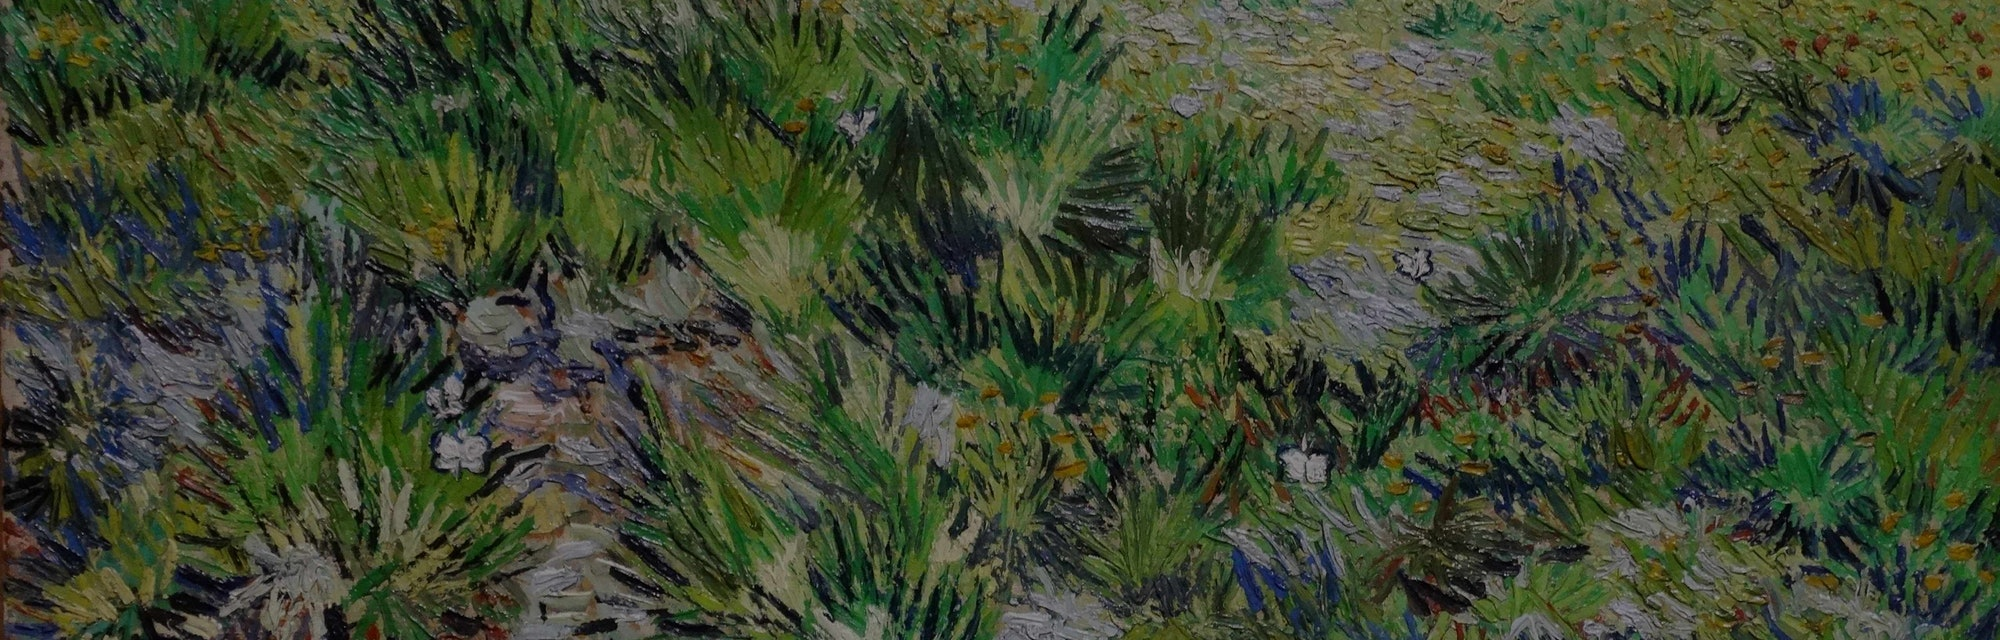 Vincent van Gogh, Dutch school. Long Grass with Butterflies, 1890. Oil on canvas (64.5 x 80.7 cm). L...